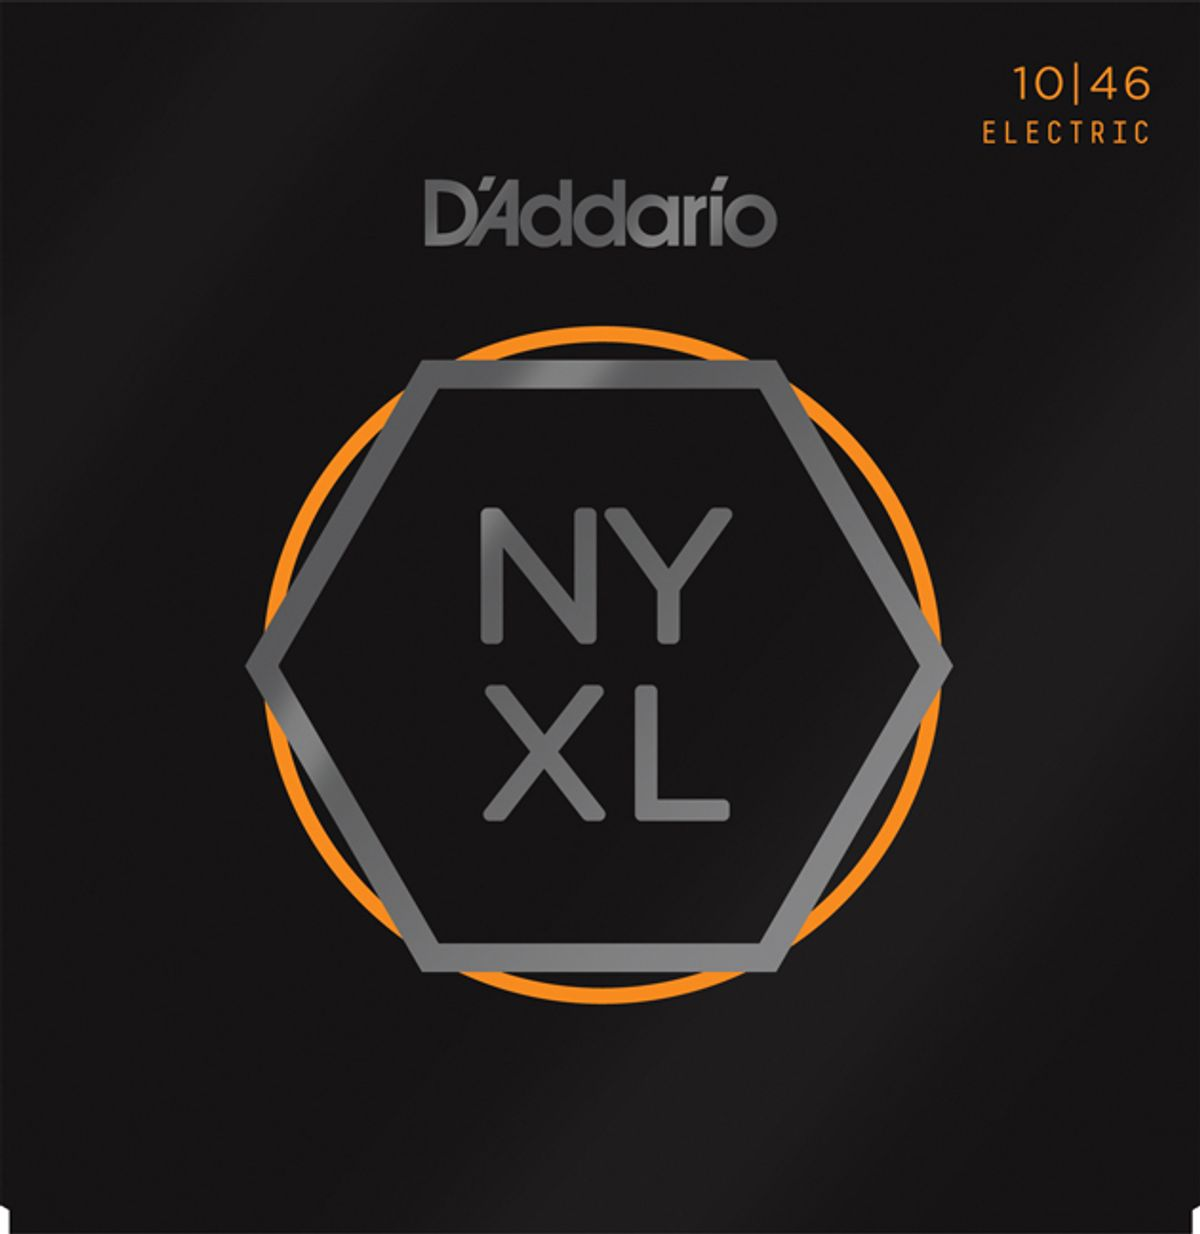 D'Addario Adds Nine Sets to NYXL Line